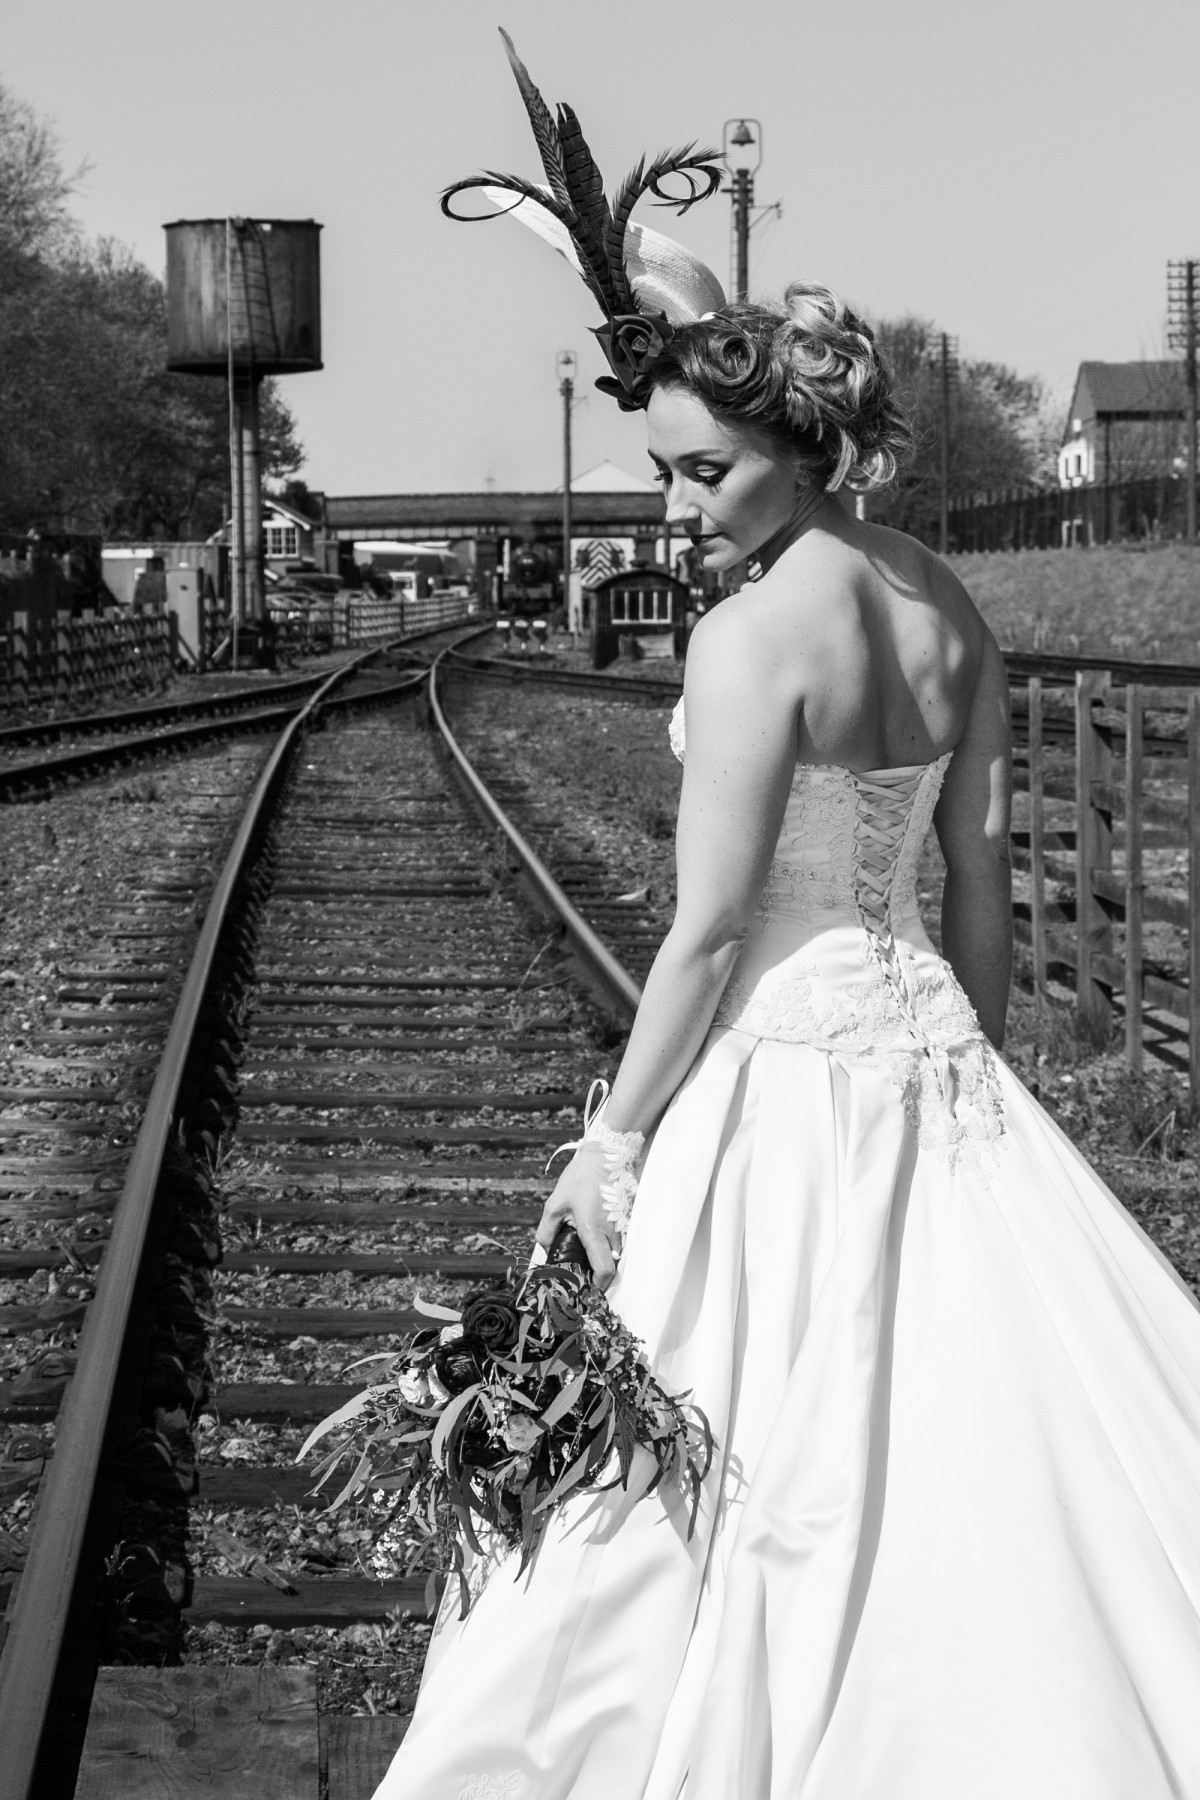 Iso Elegant Photography - Leicester wedding network - Railway wedding - vintage wedding 34